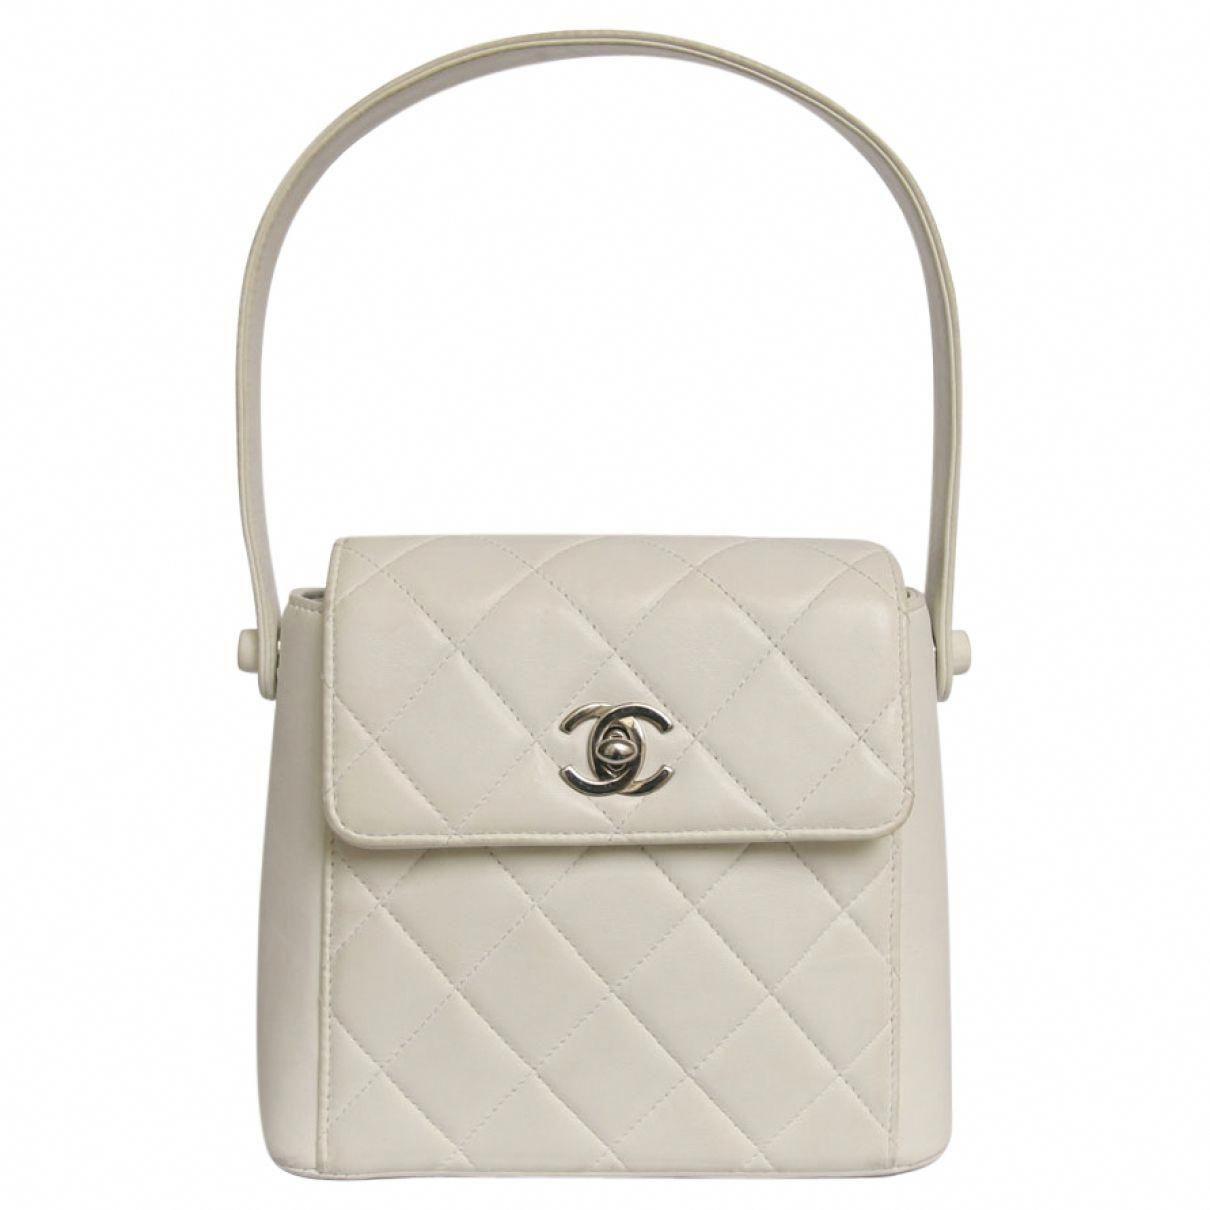 79fb5dcd2bb2 Chanel White Mini Bag | Vestiaire Collective #WomensShoulderbags ...